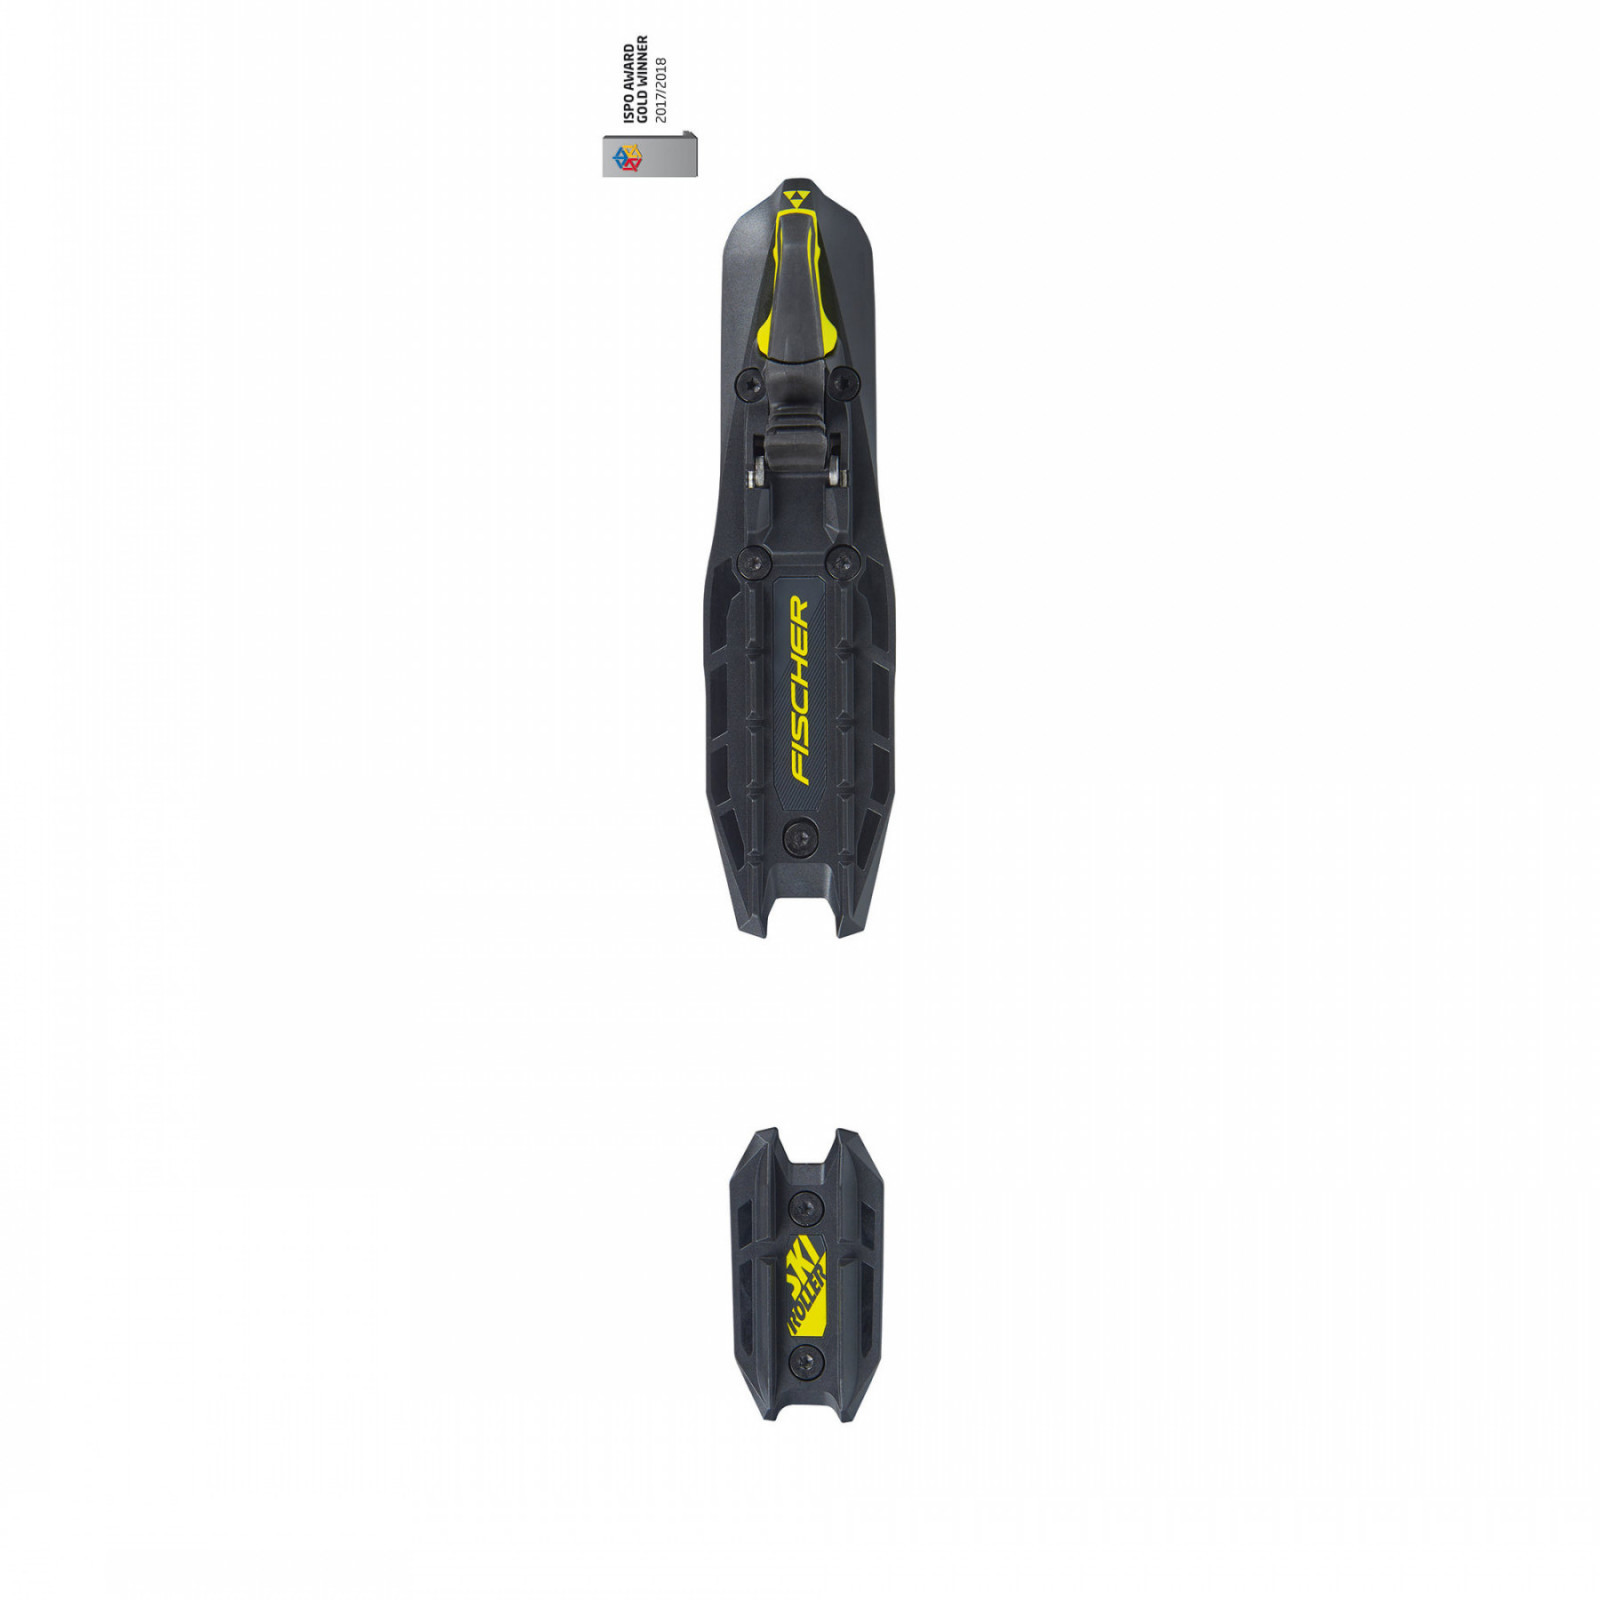 Fischer XC-BINDING ROLLERSKI SKATE BLACK YELLOW